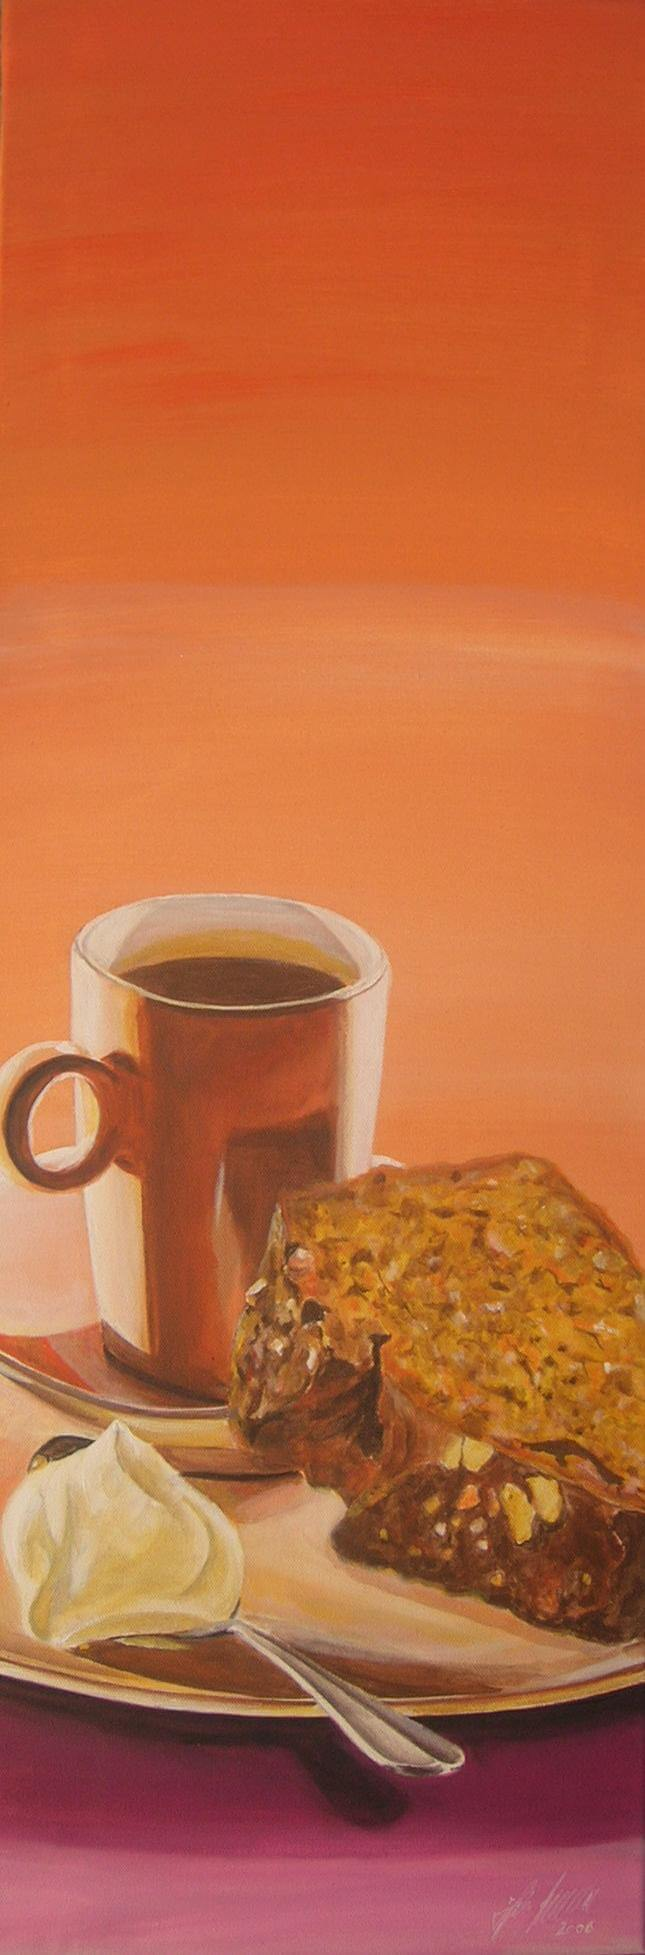 "Fr. 500.00 ""Kaffee und Kuchen"" Acryl auf Leinwand 30 x 90 cm."